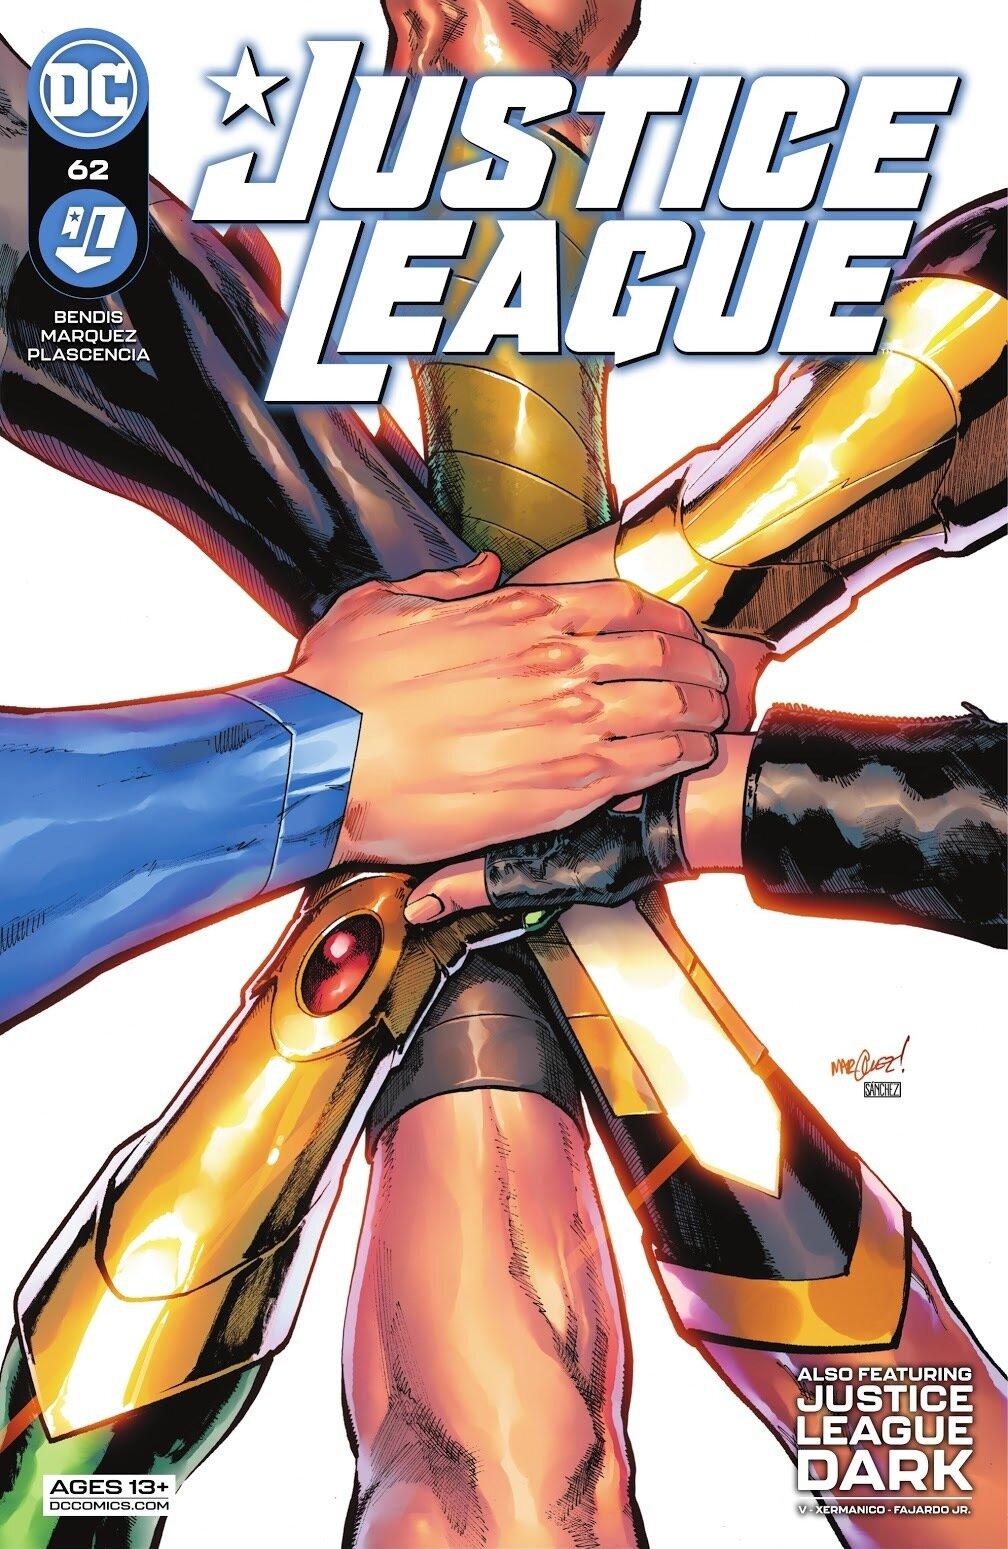 Justice League 62, cover, 2021, David Marquez